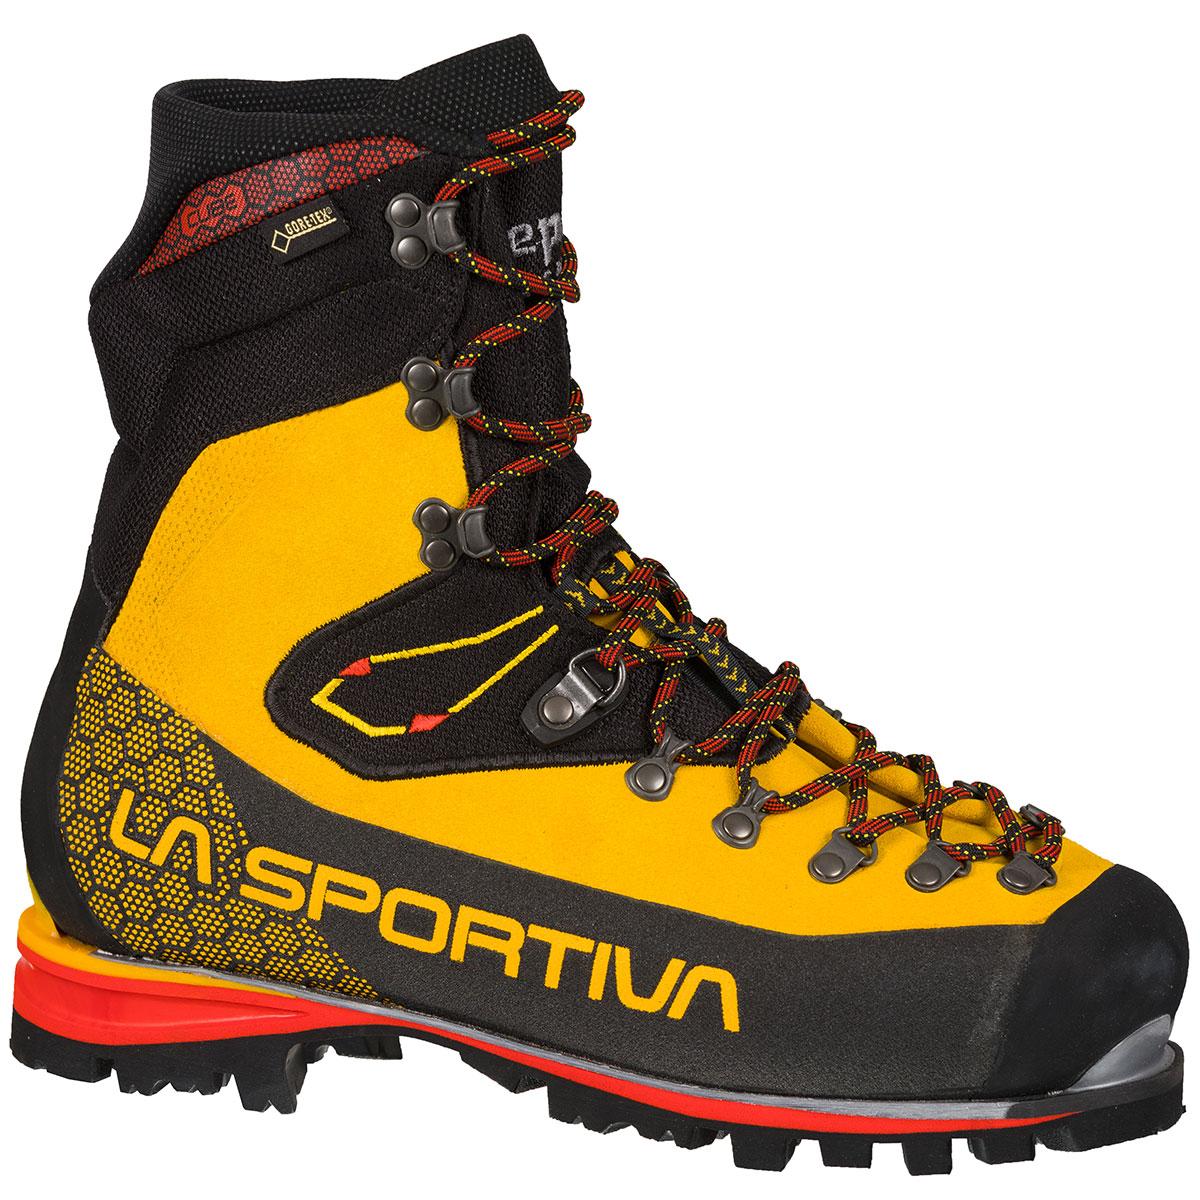 super popular 56958 3b6ee Scarponi da alpinismo Nepal Cube GTX de La Sportiva